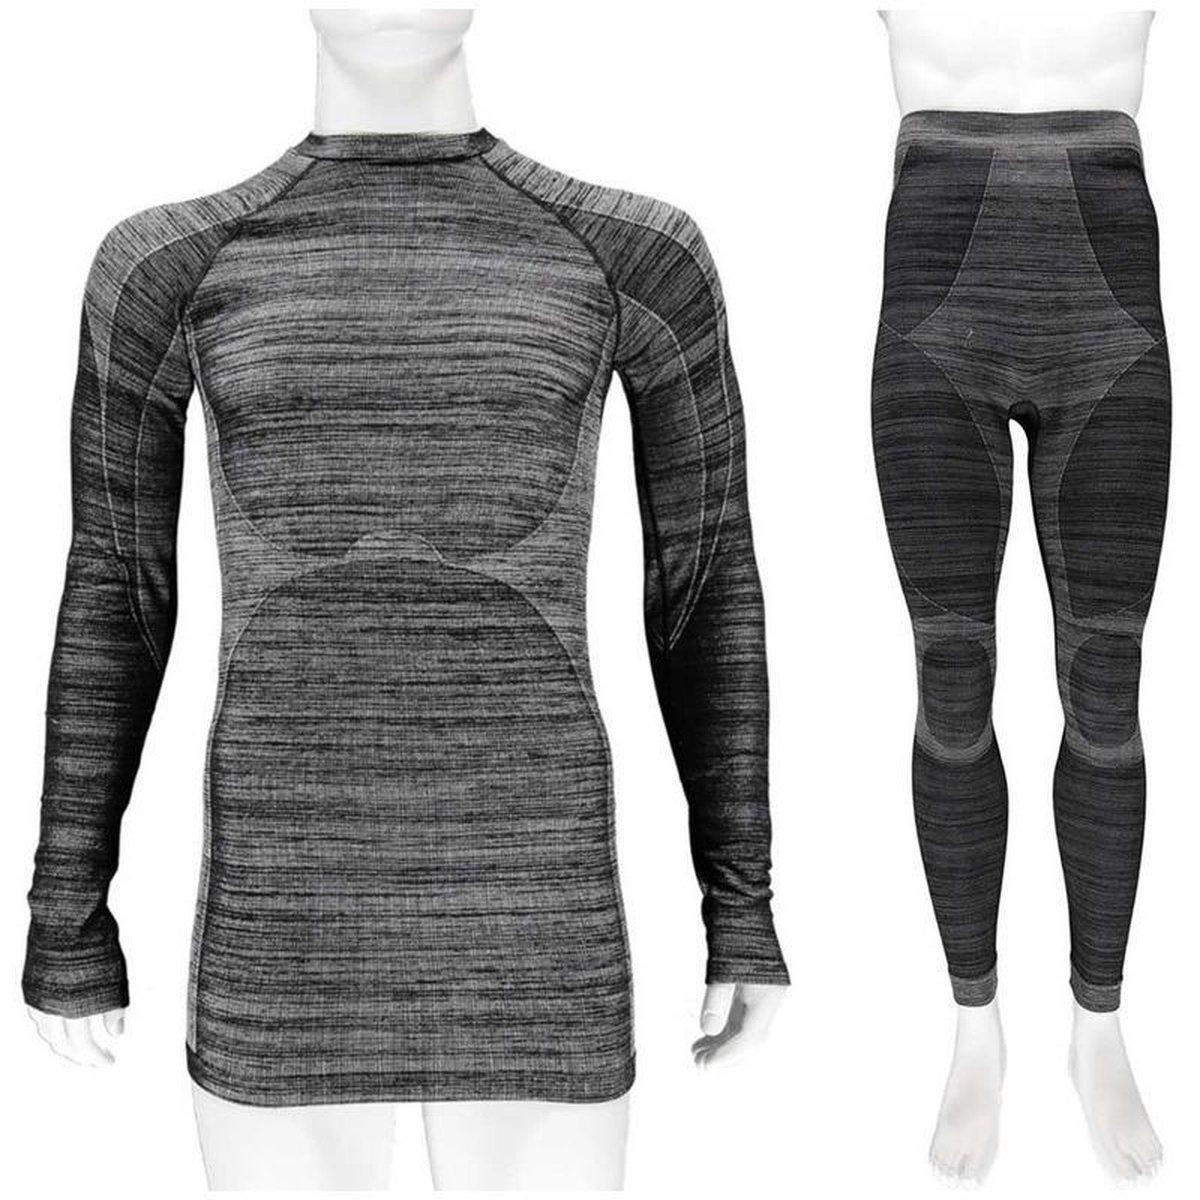 Thermo onderkleding set voor heren zwart melange - maat M - shirt lange mouw en broek - Wintersport kleding - Thermokleding